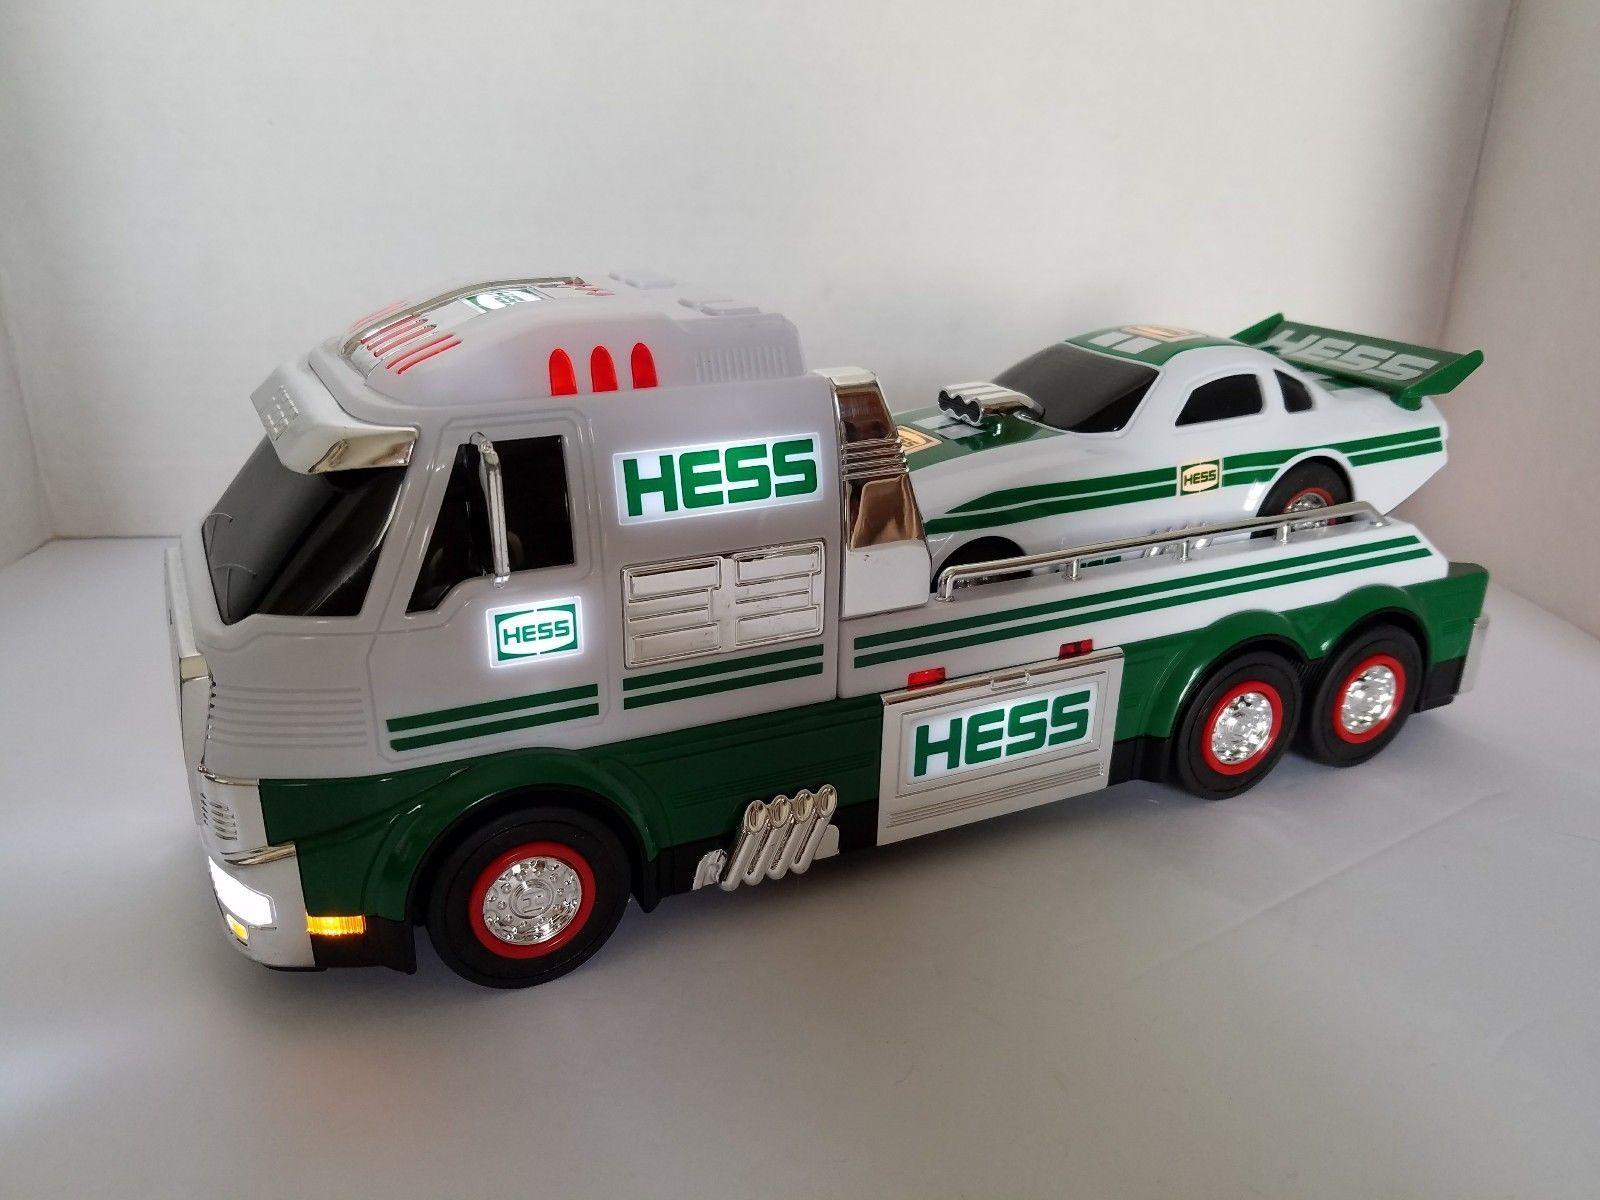 2016 Hess Semi Truck Race Car Dragster Hauler With Car Lights